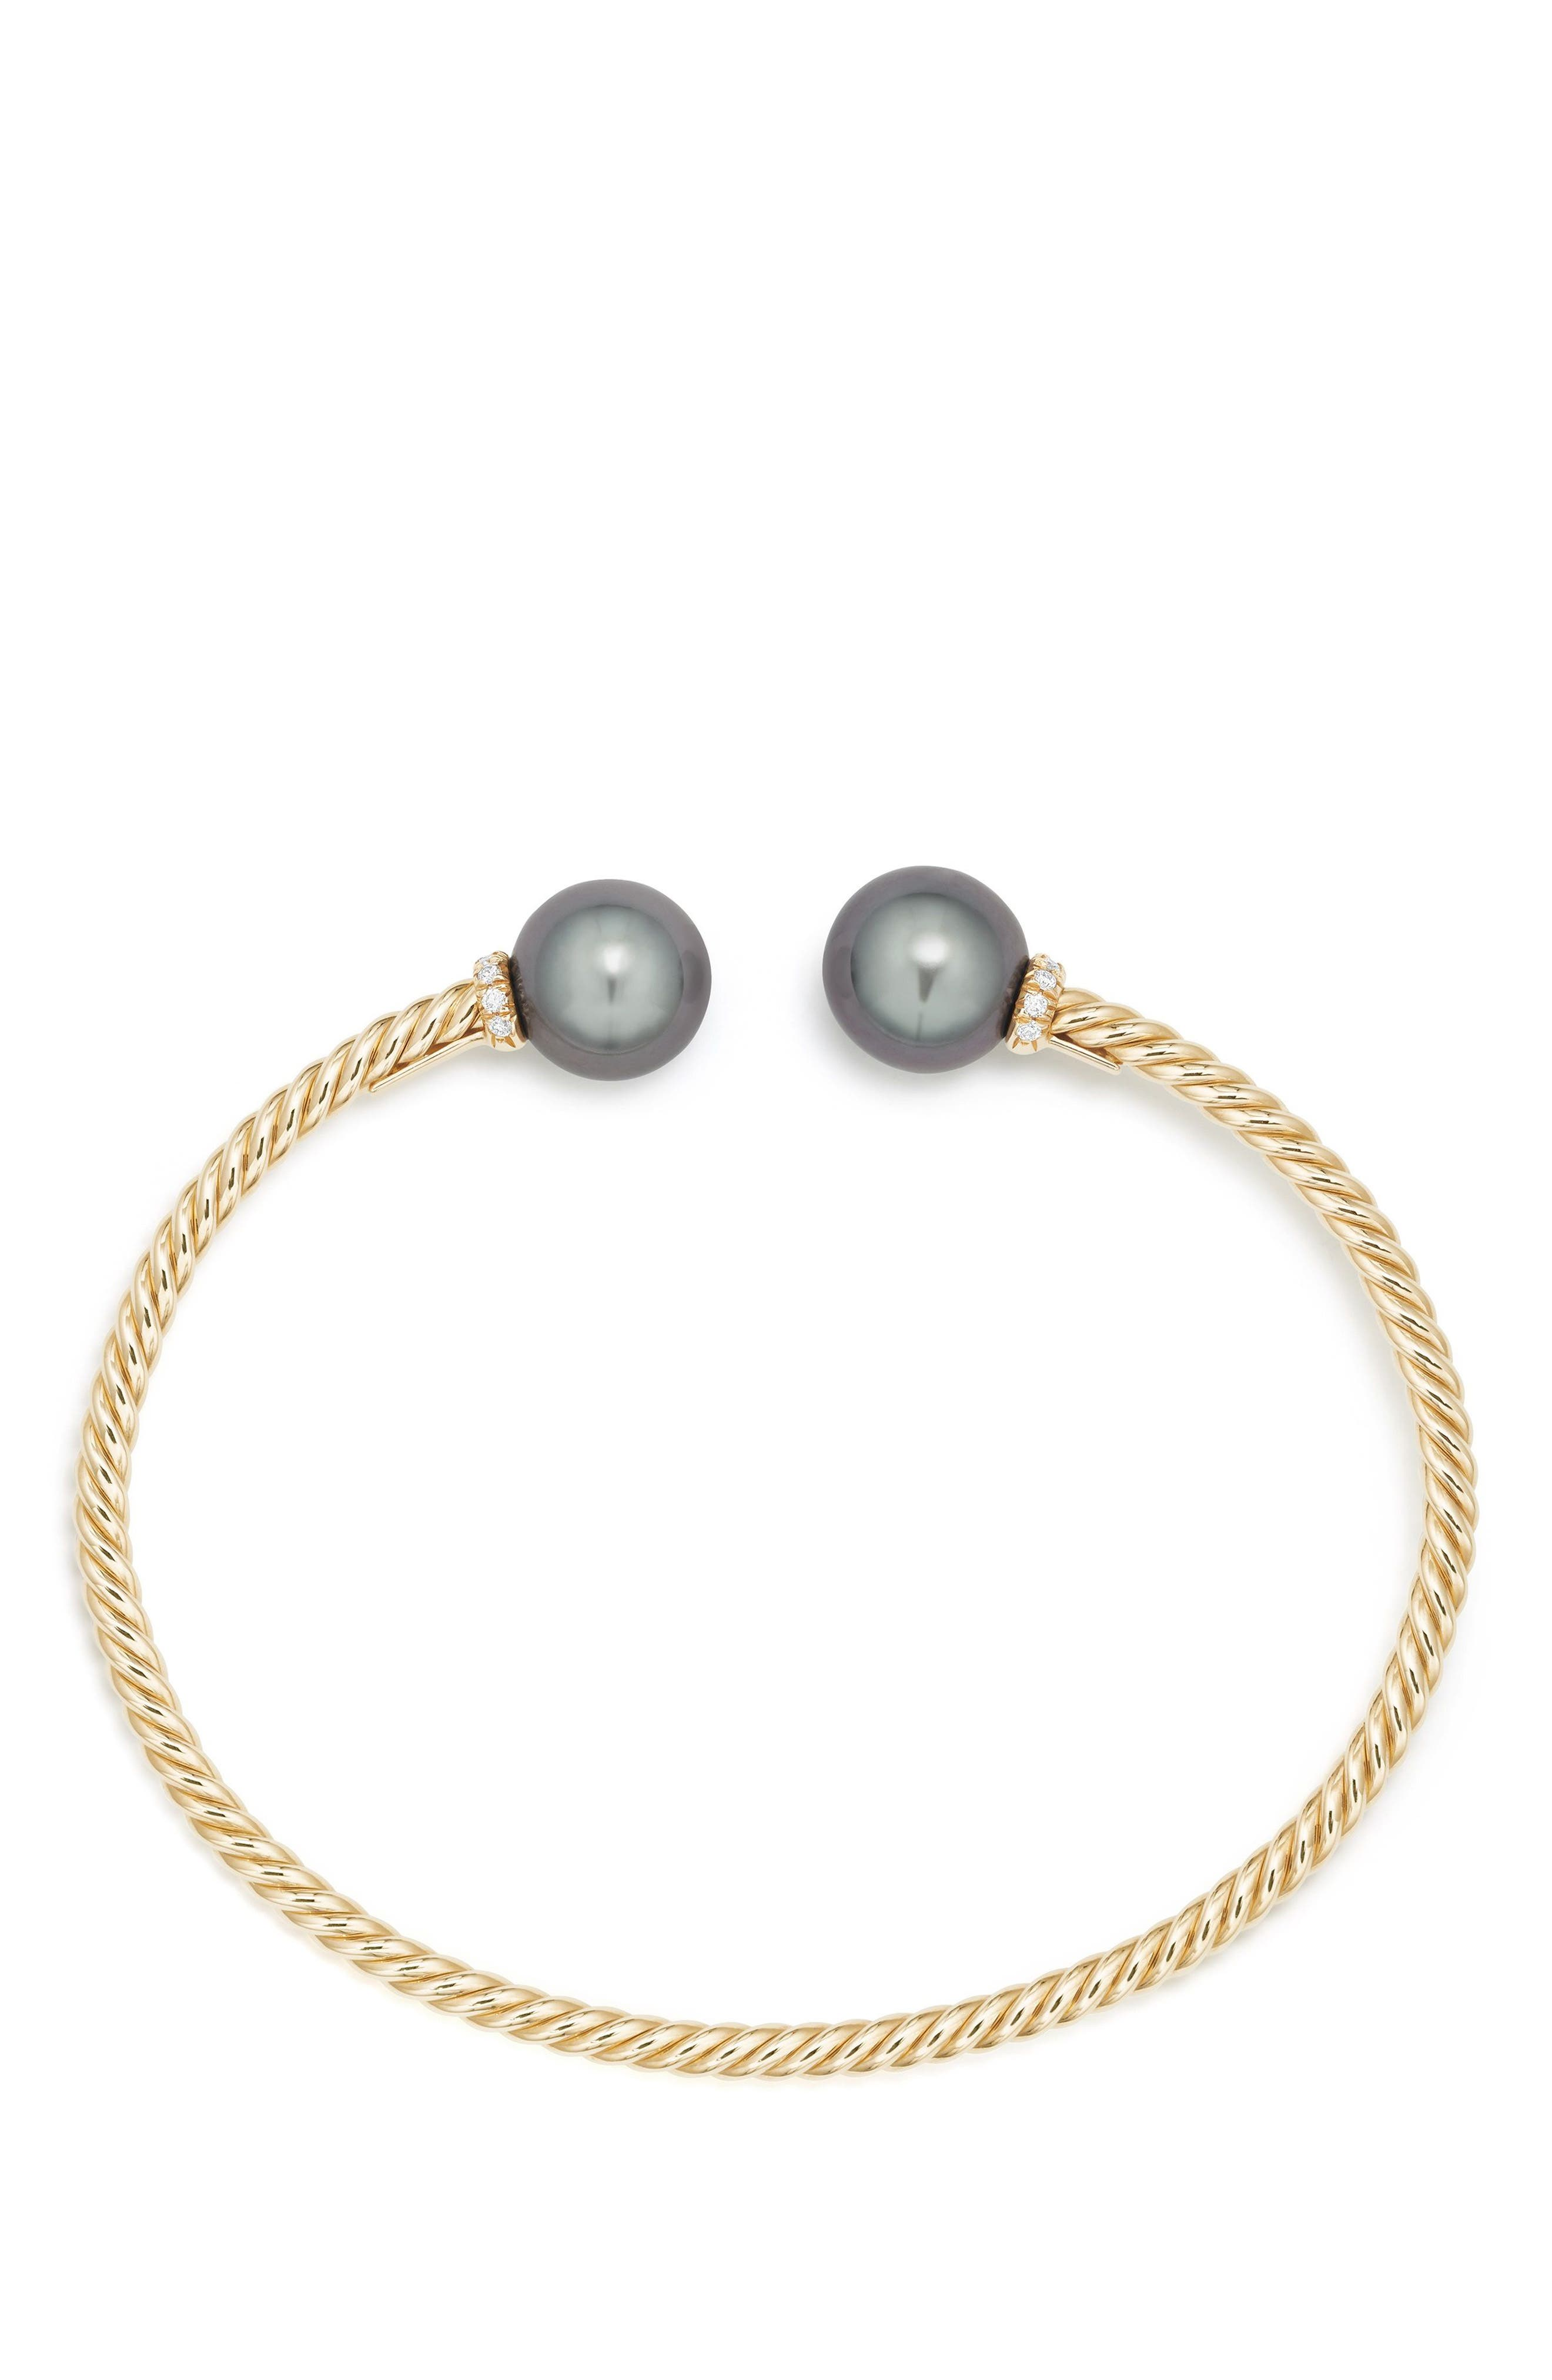 Solari Bead Bracelet with Diamonds,                             Alternate thumbnail 2, color,                             GOLD/ DIAMOND/ GREY PEARL